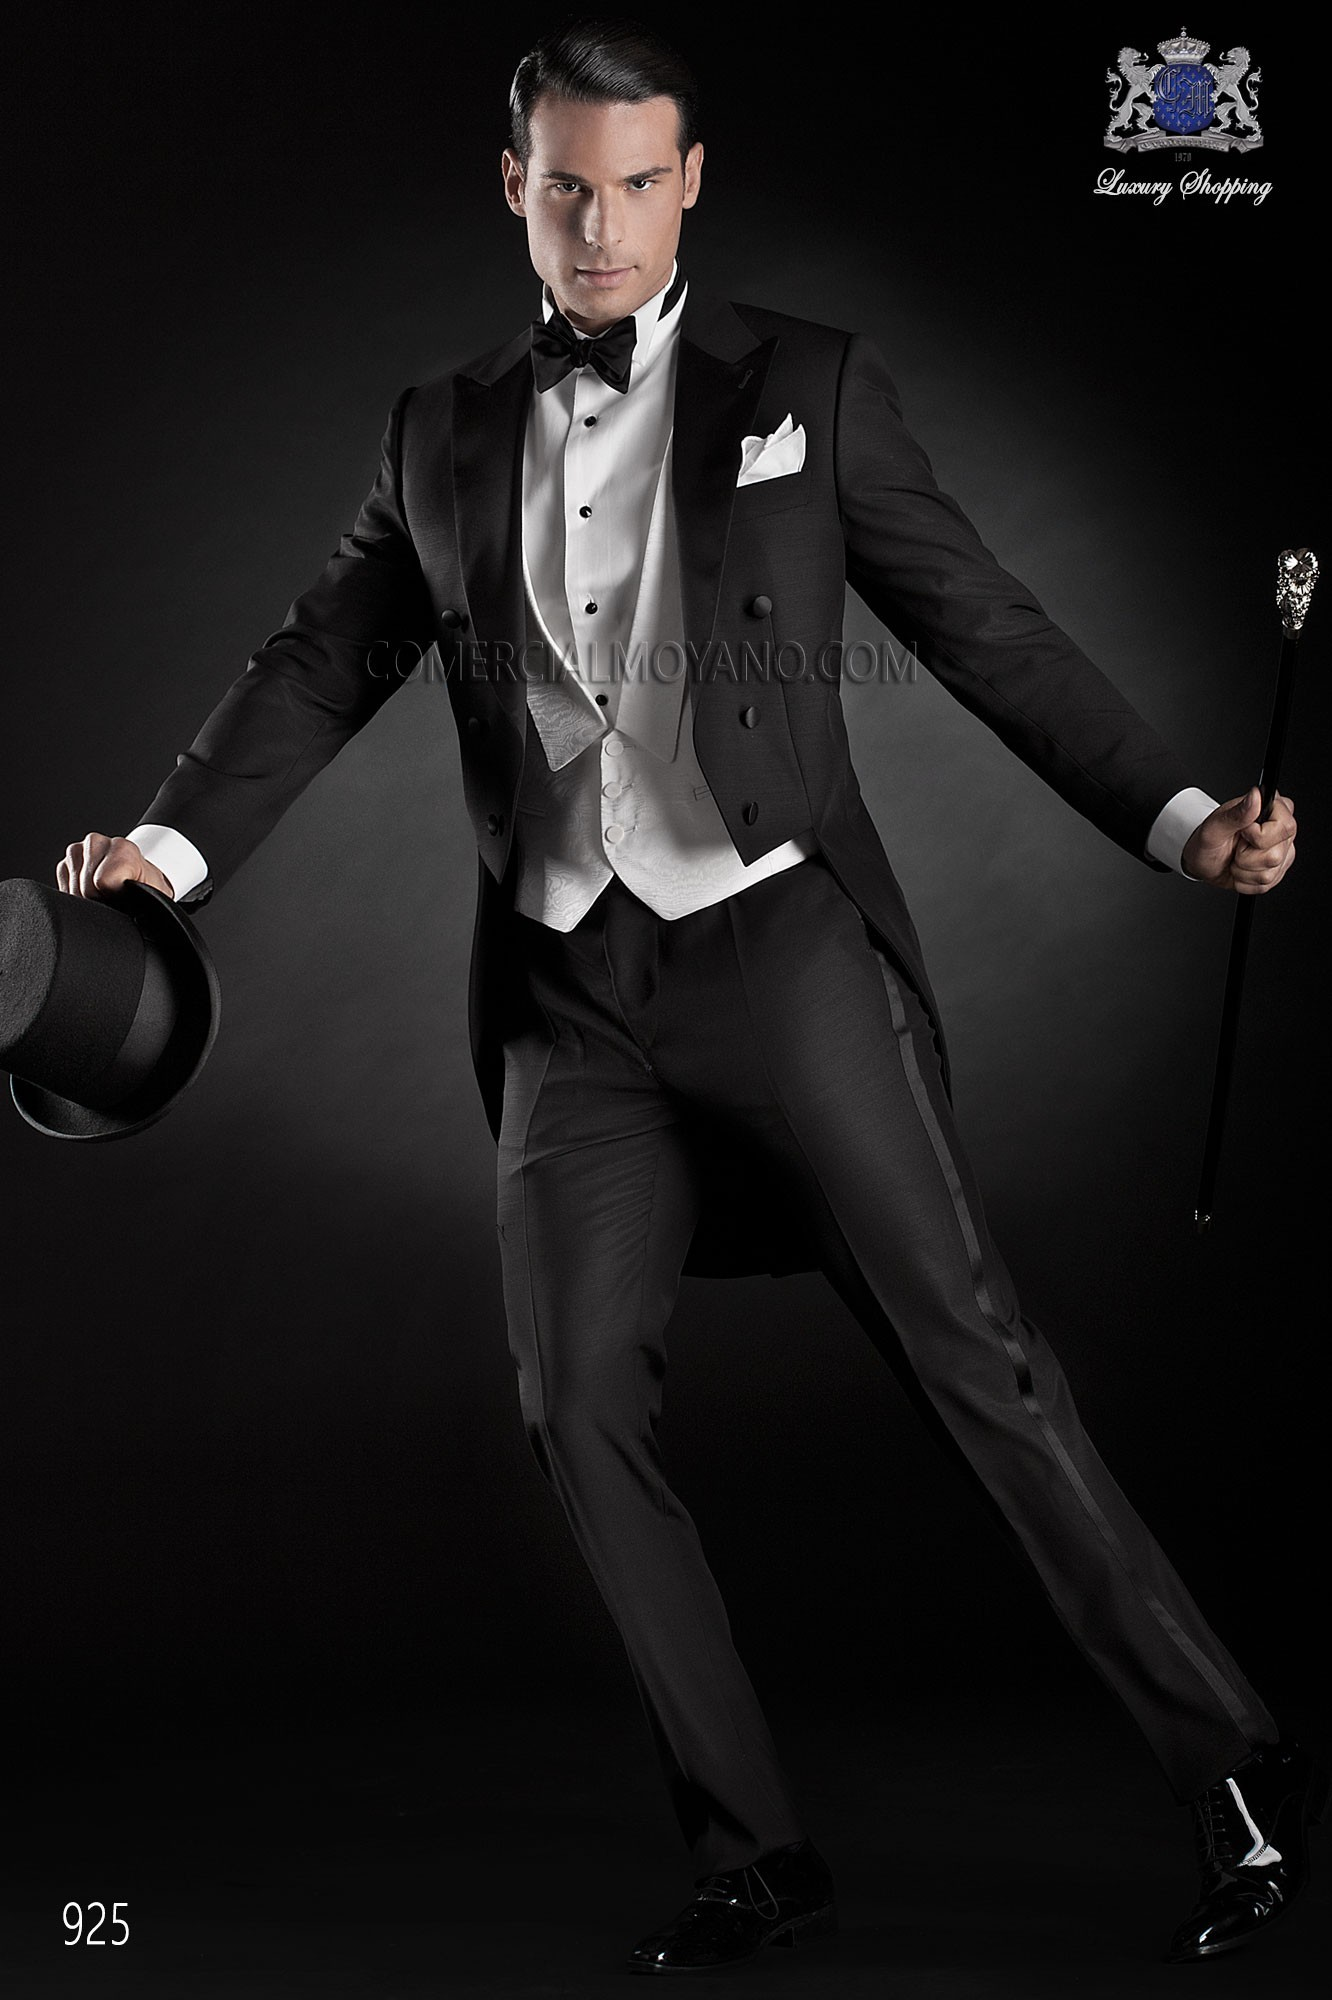 Black Tie black men wedding suit model 925 Ottavio Nuccio Gala